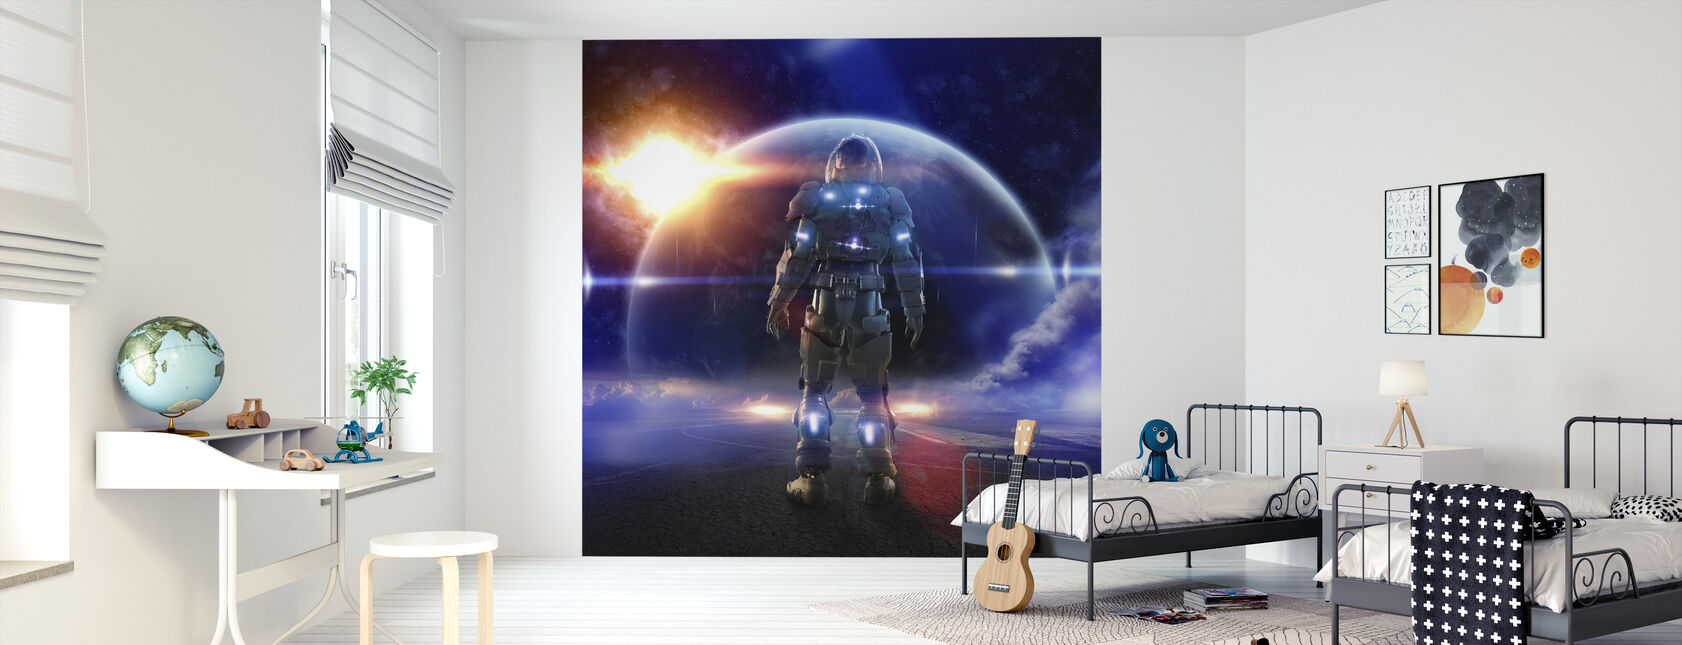 Space Knight - Wallpaper - Kids Room